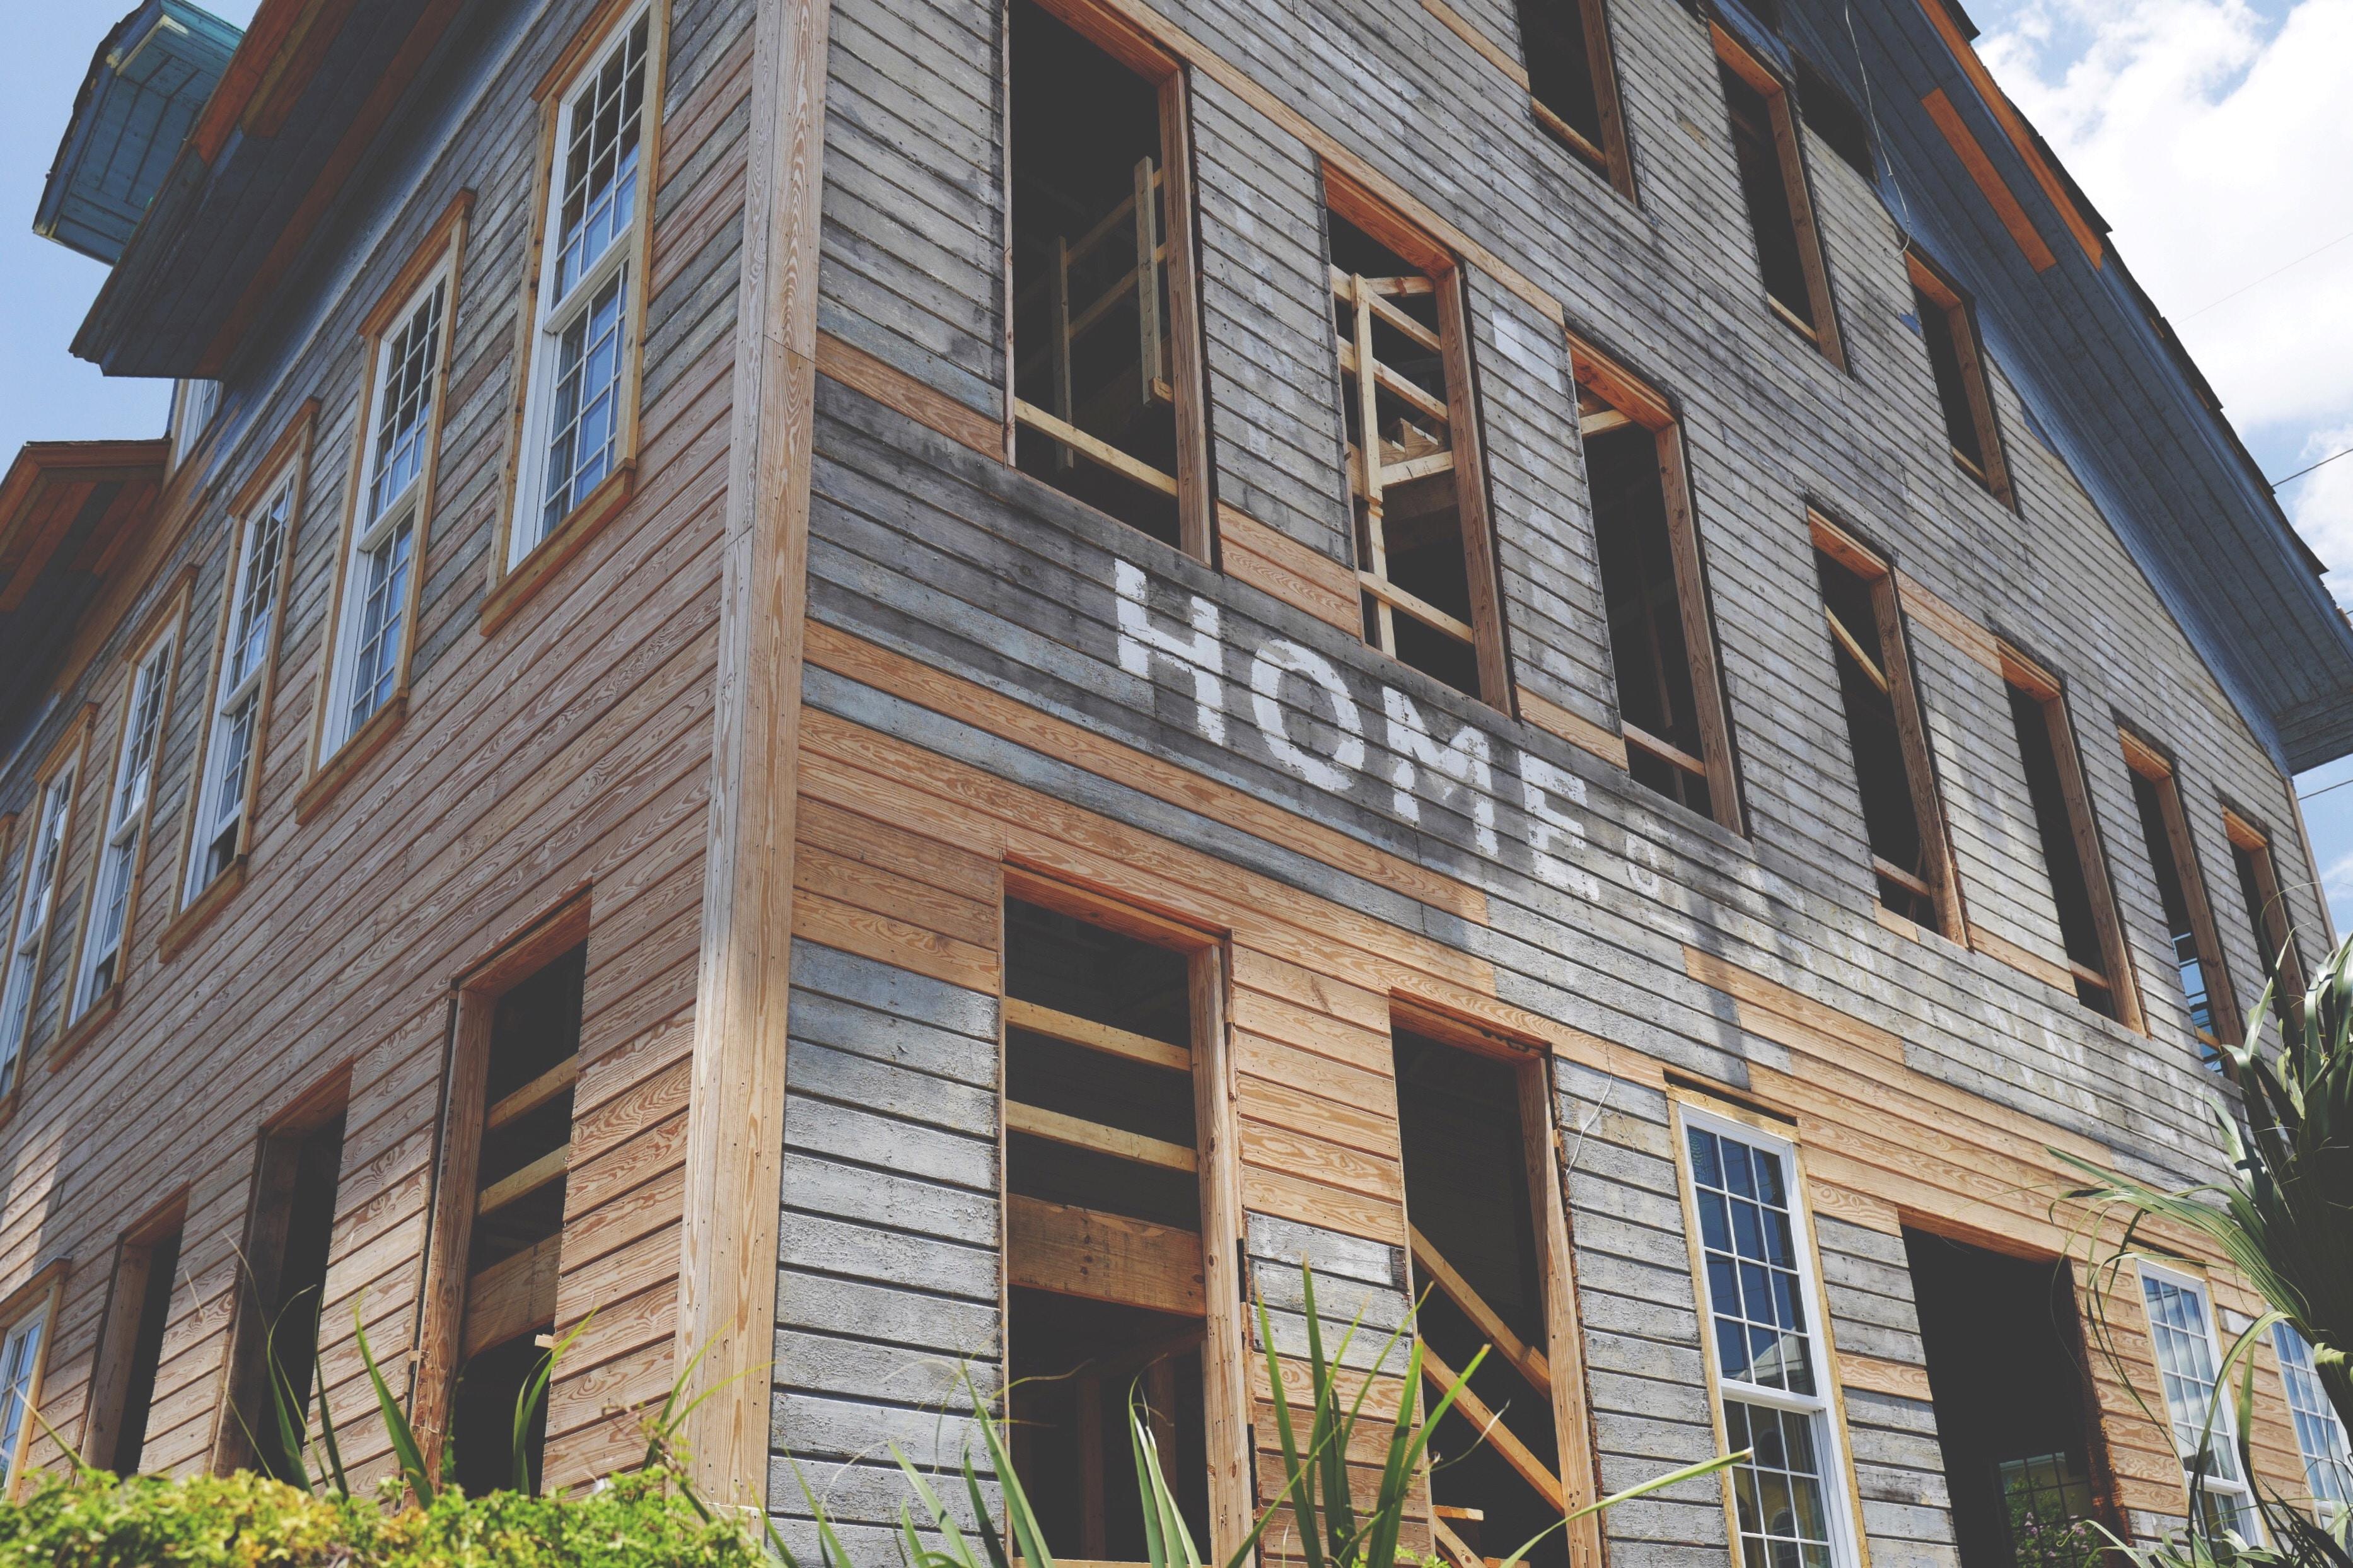 Home Insurance in Falun, by Wisconsin